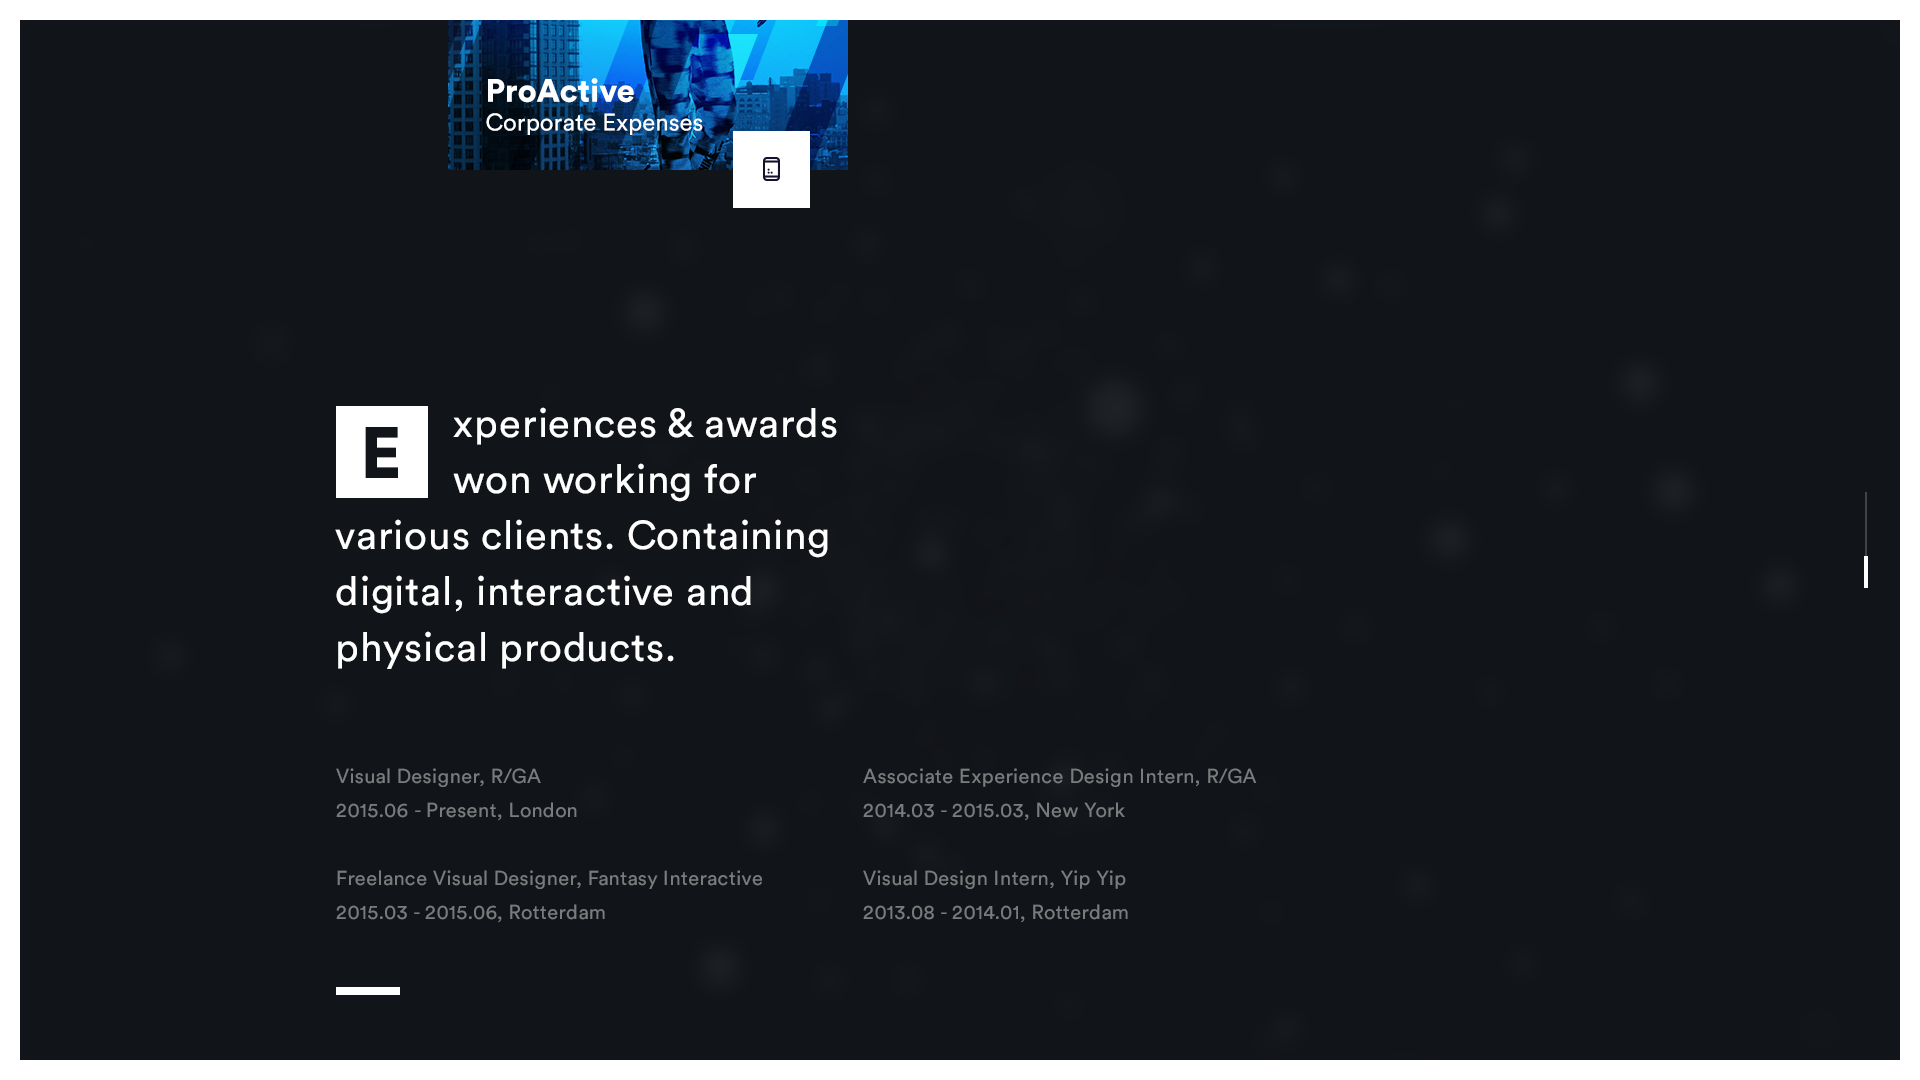 Portfolio new awards